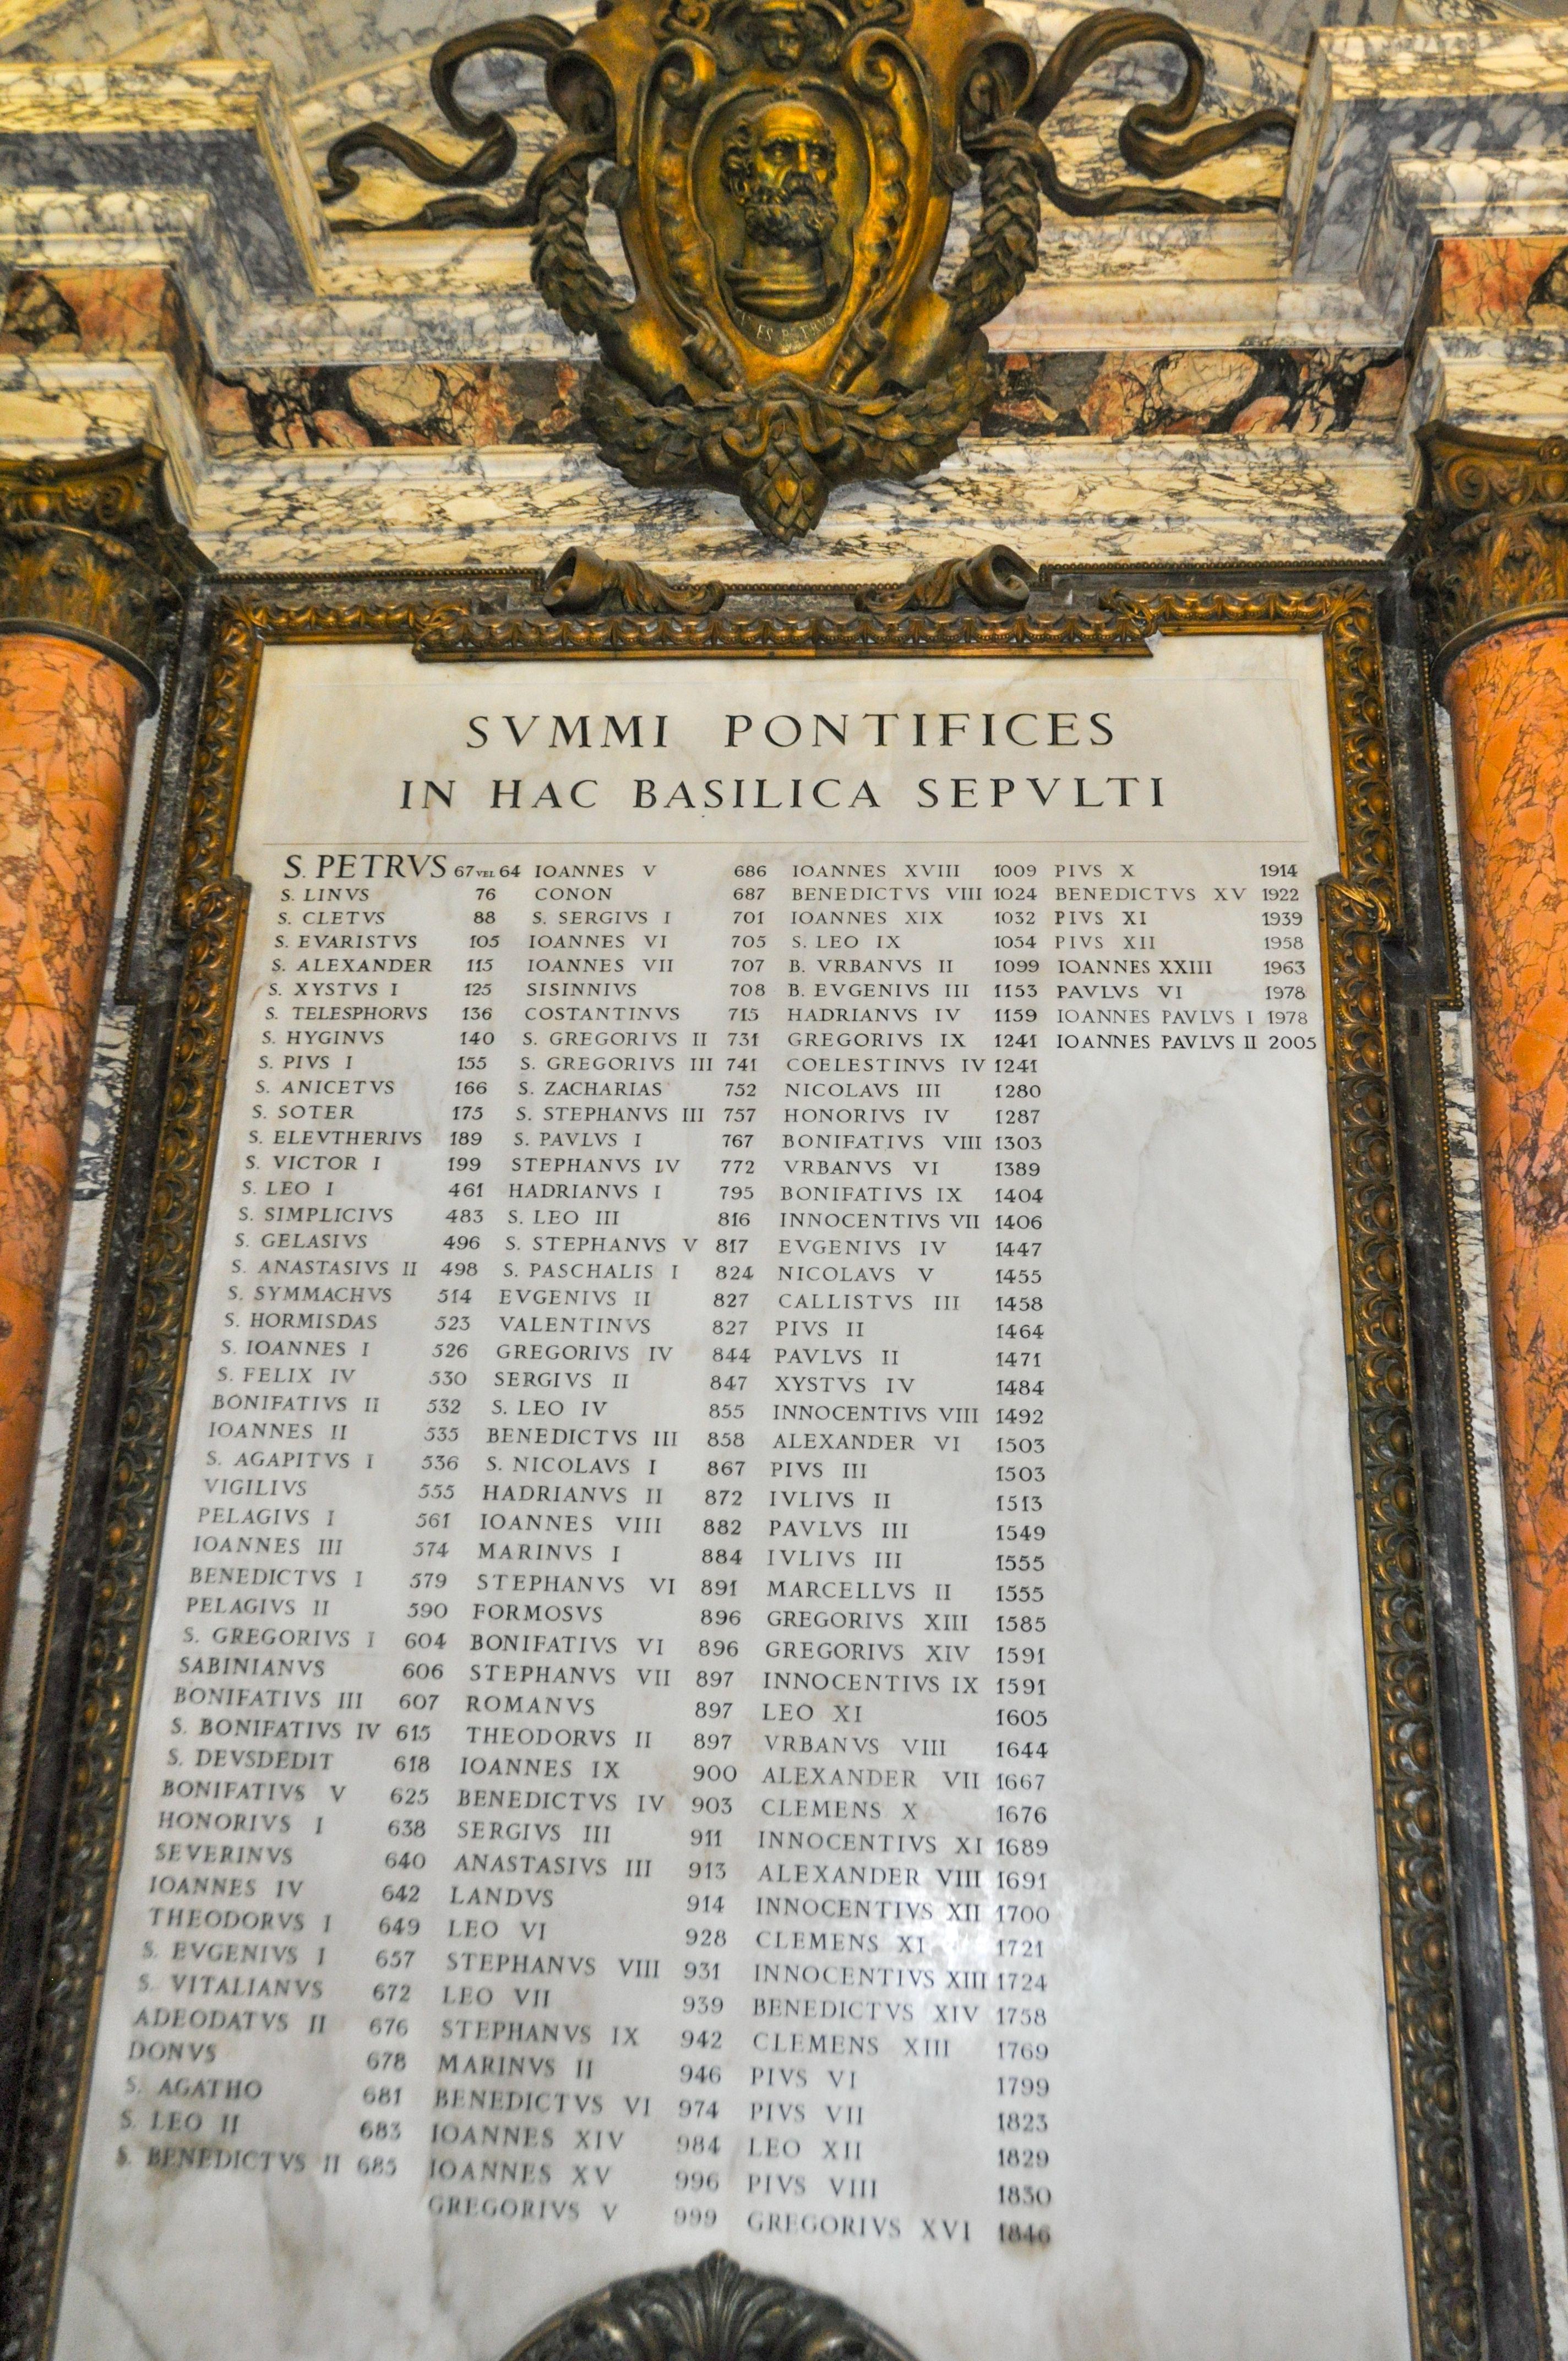 List of catholic popes pdf to jpg